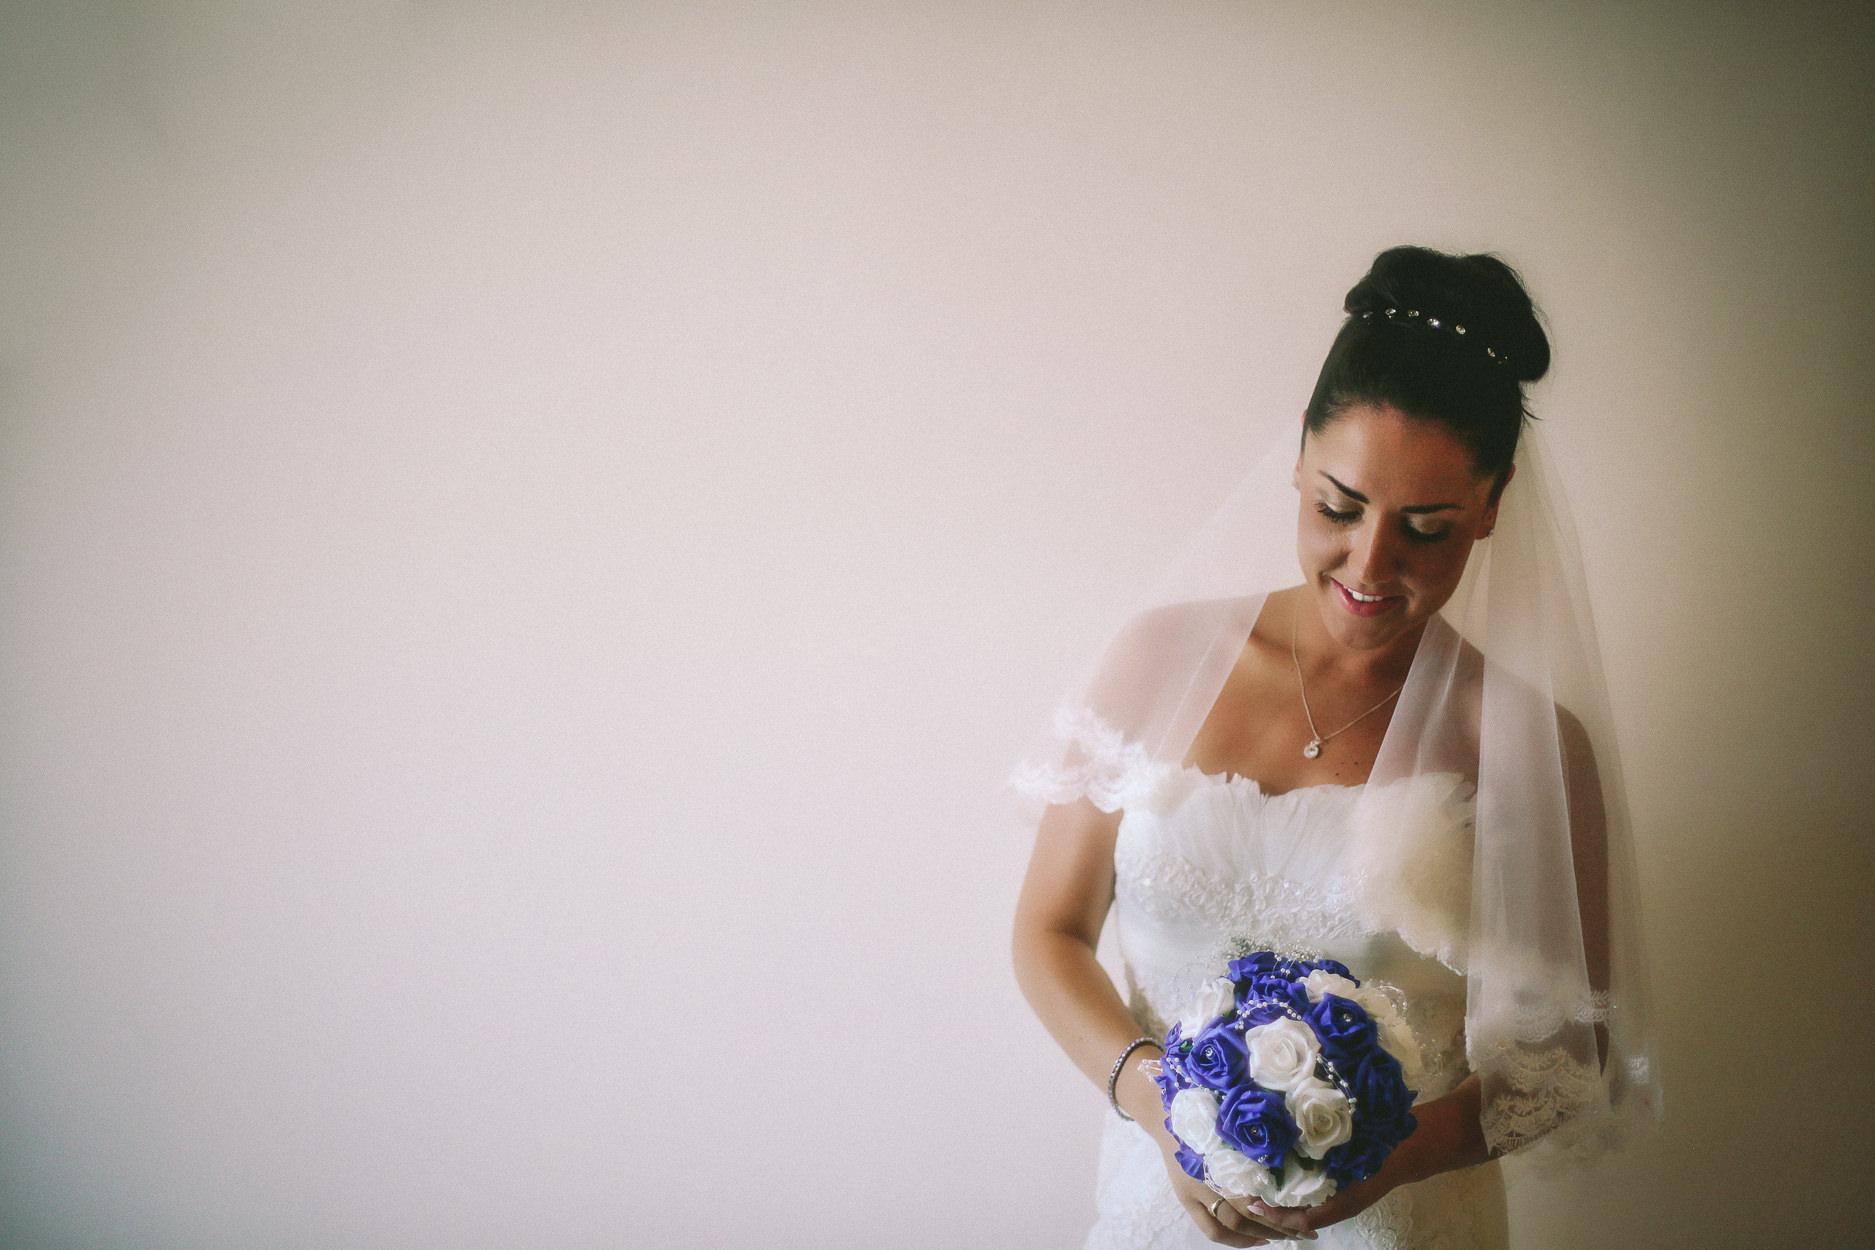 English-Wedding-Photographer-Sorrento- Rivage-Hotel-Pridal-Preparations-Pronovias-Wedding-Dress-18